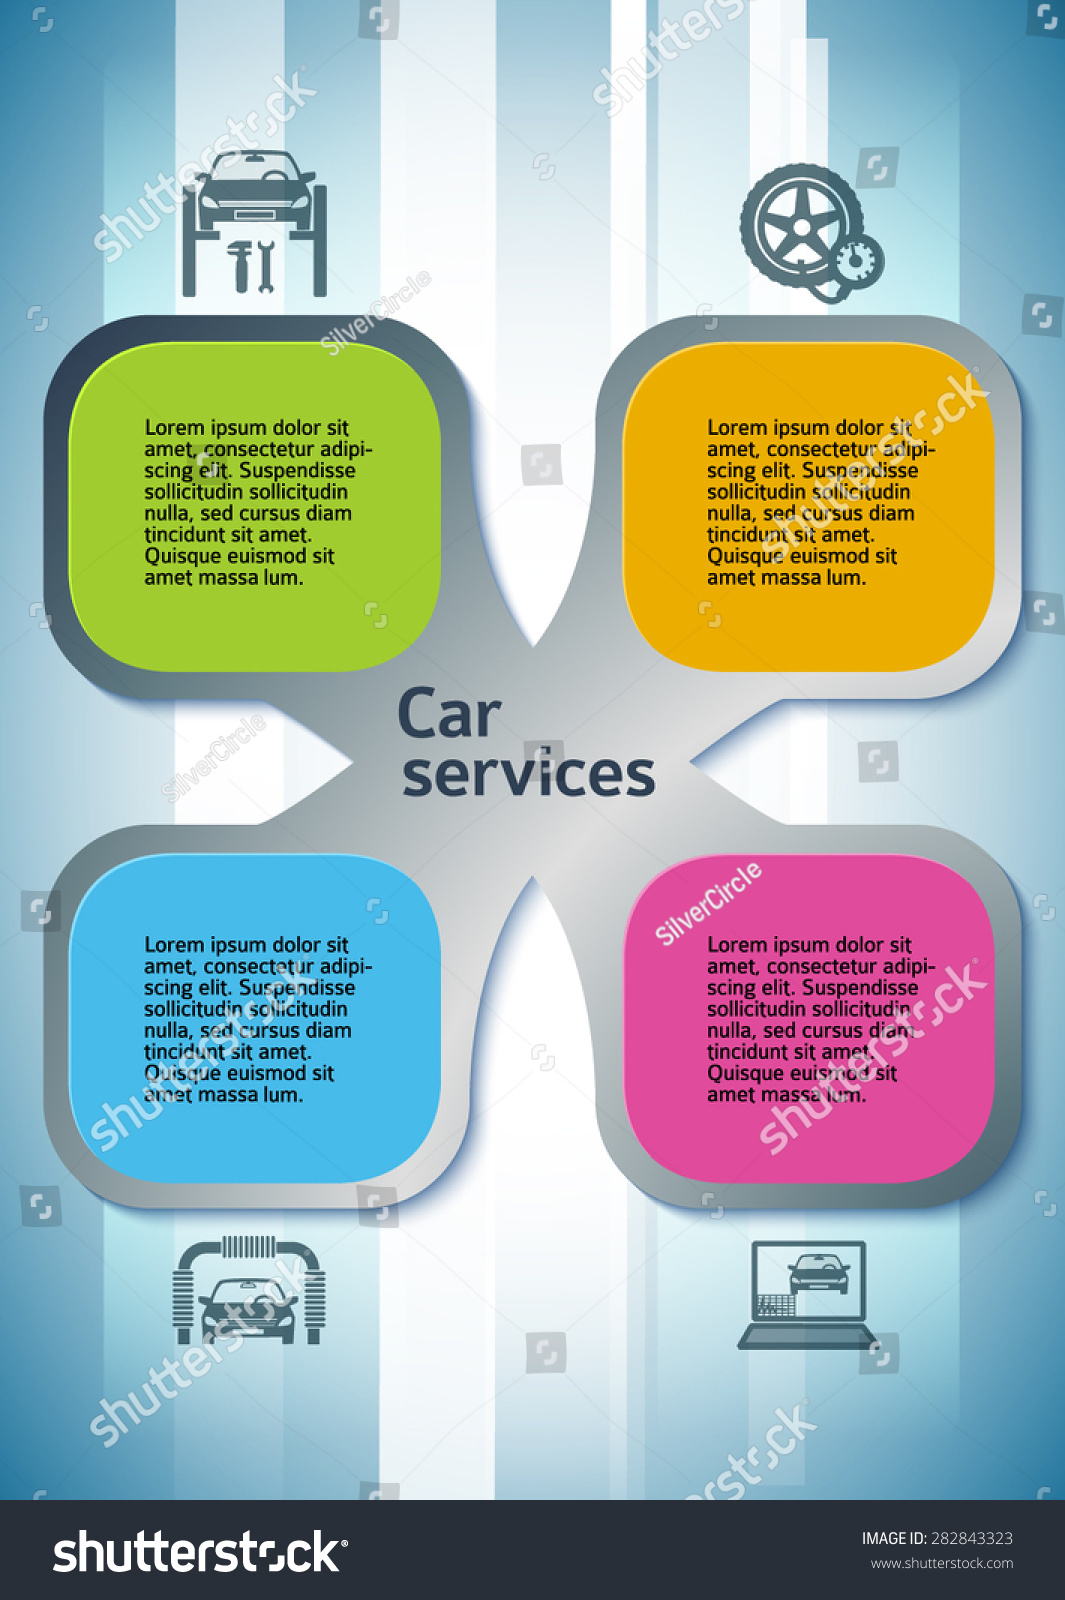 A Sample Auto Repair Shop Business Plan Template